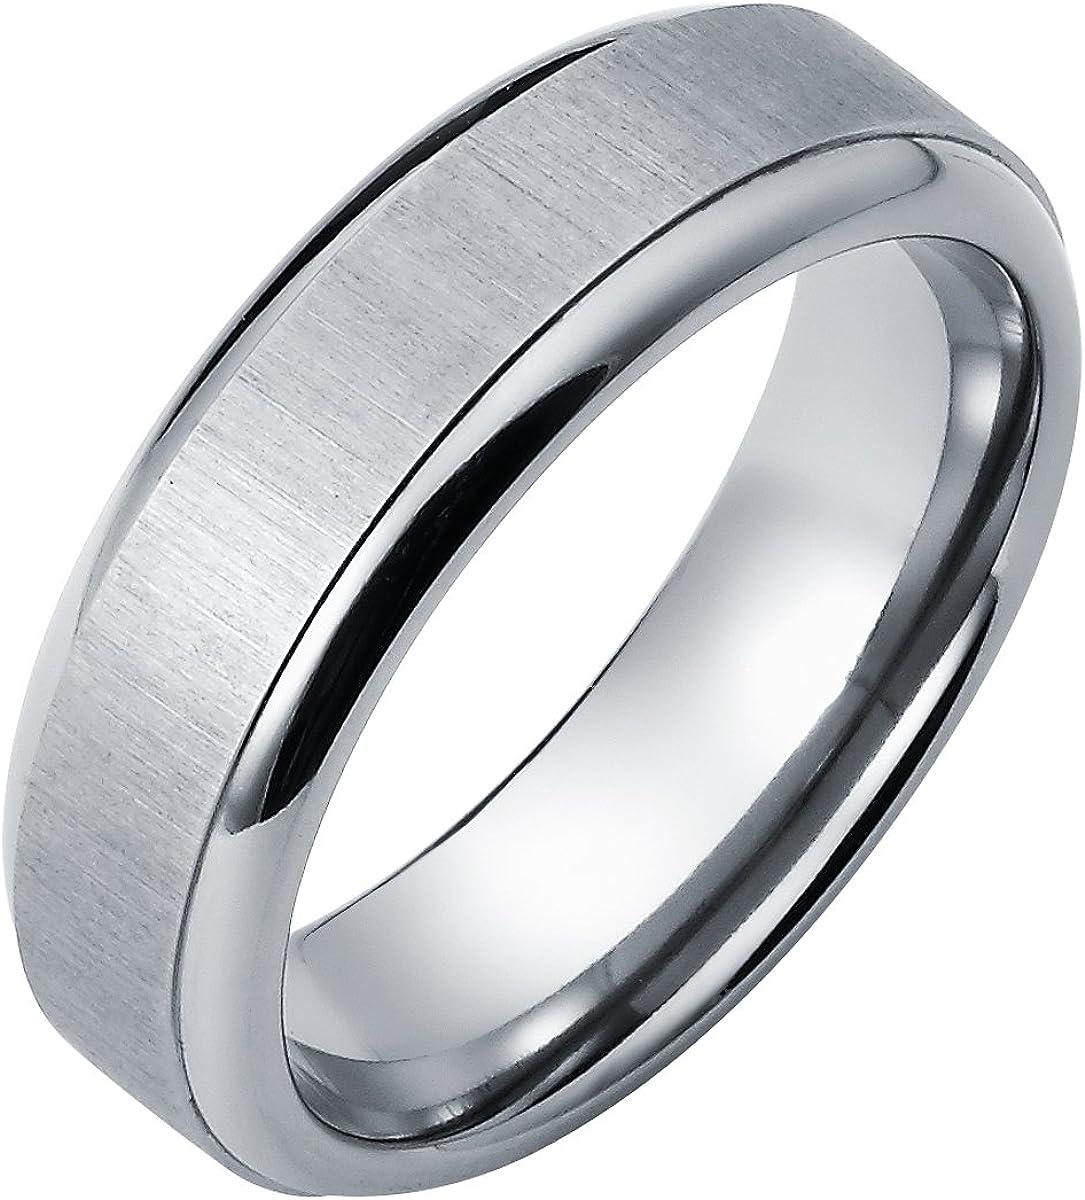 7F-ST New 7mm Wide Comfort Fit Titanium Ring